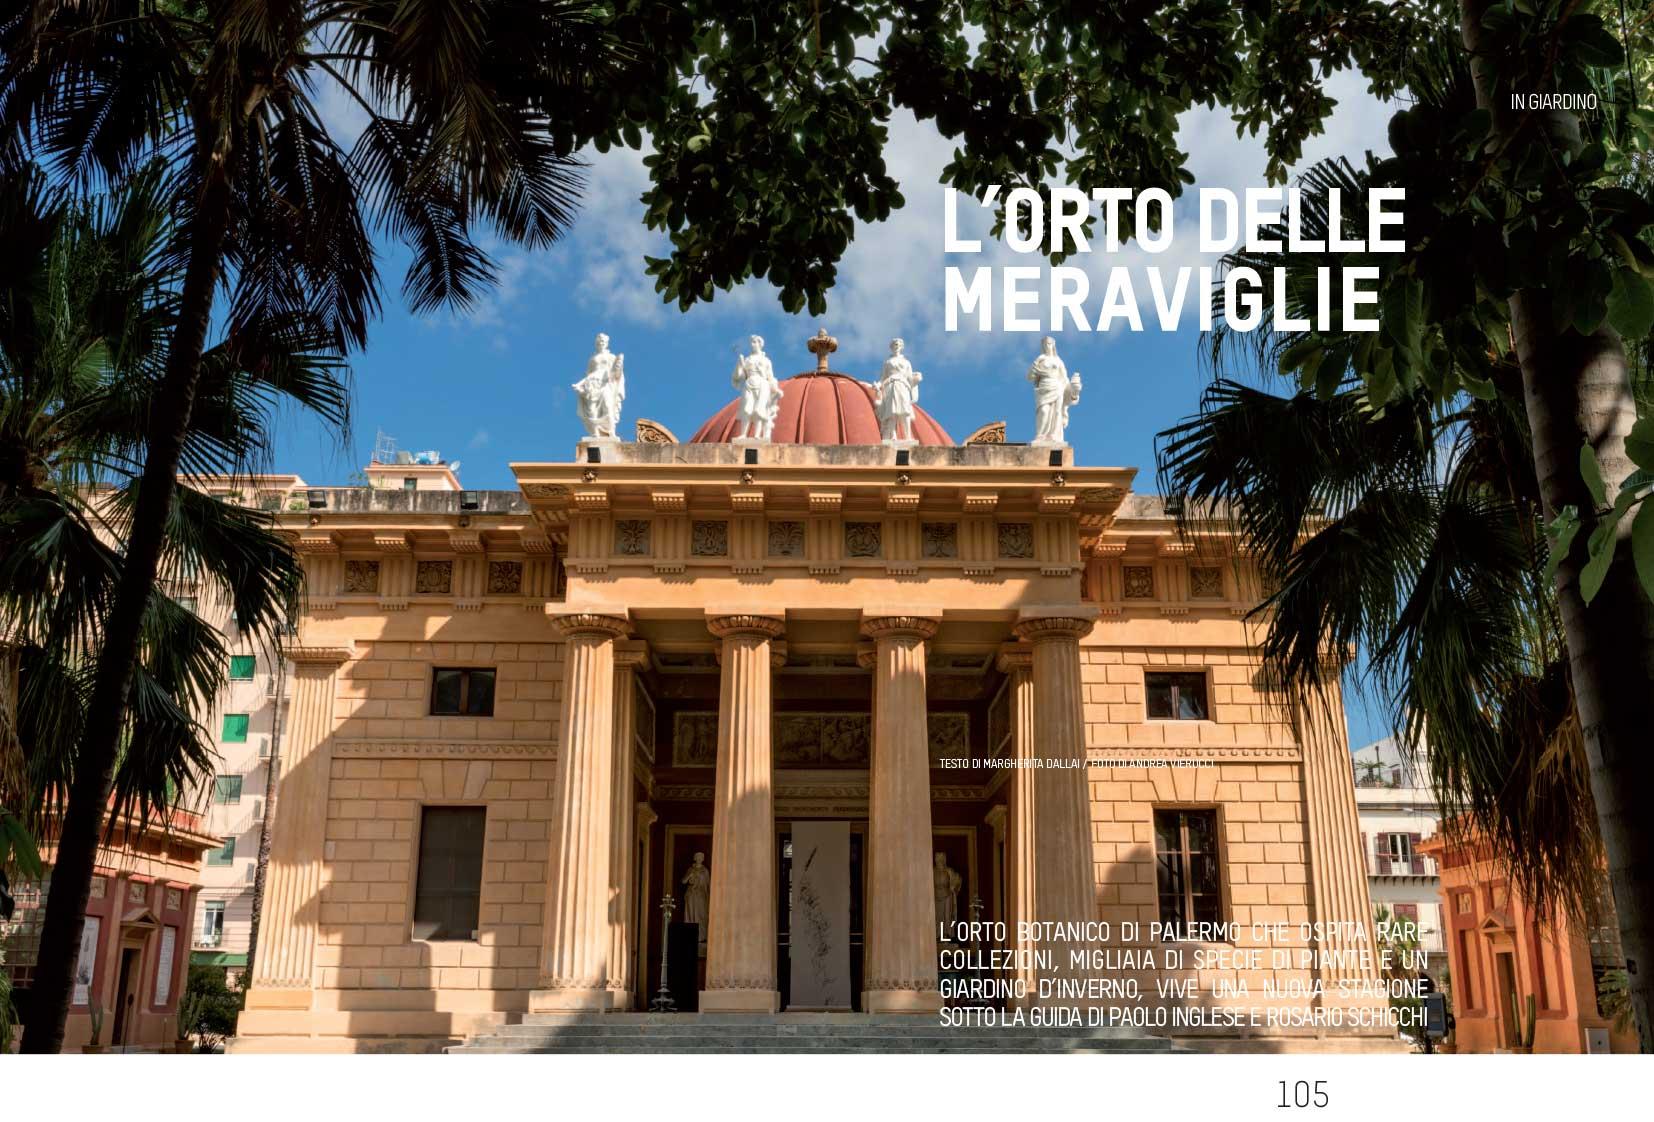 1p104-121_VIS_VG_sett2018_IN-GIARDINO_Orto_Botanico_Palermo-1